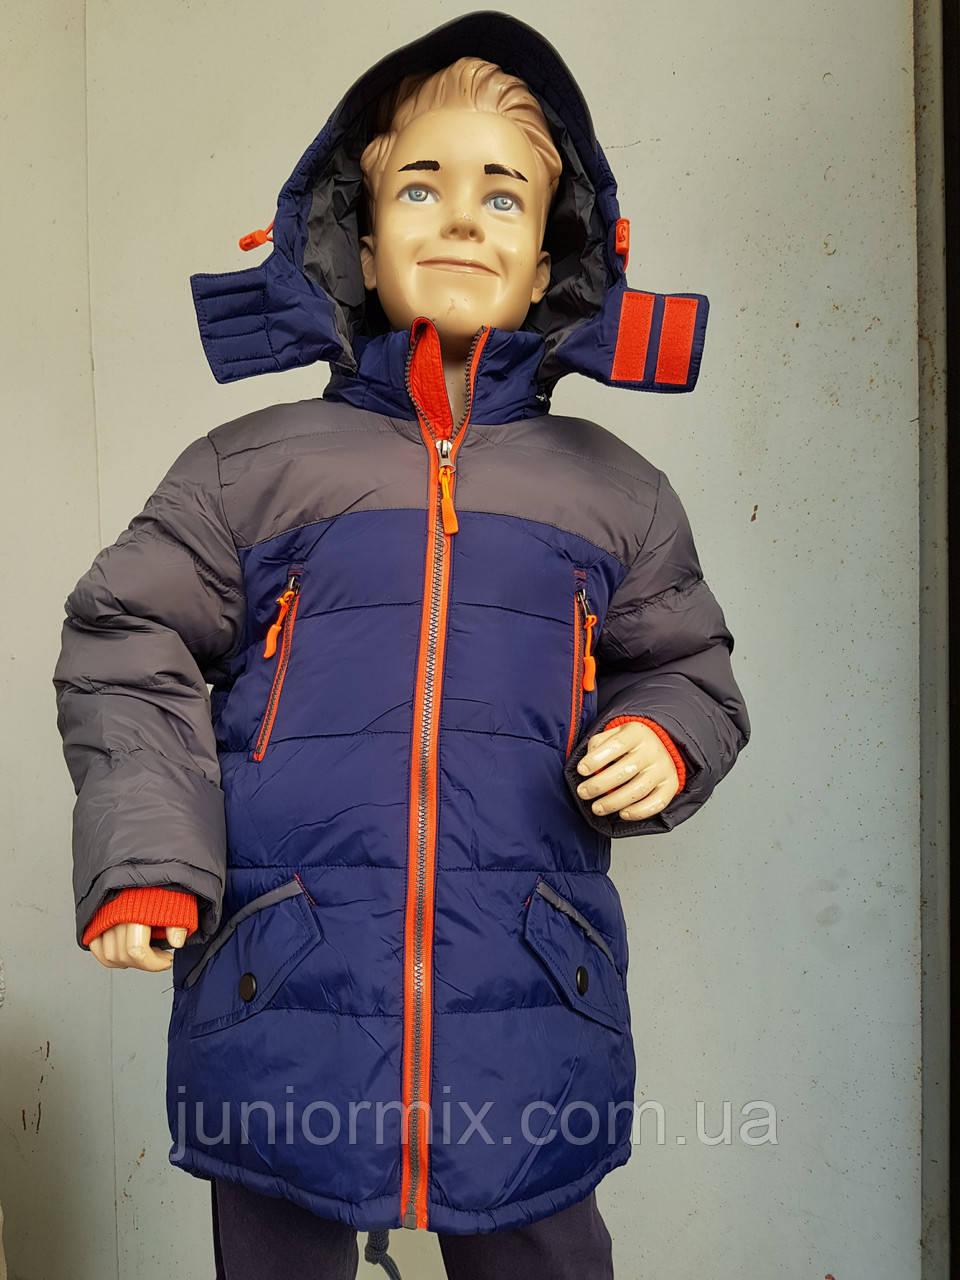 Куртка зимняя на мальчика HIKIS двухцветная маленькая